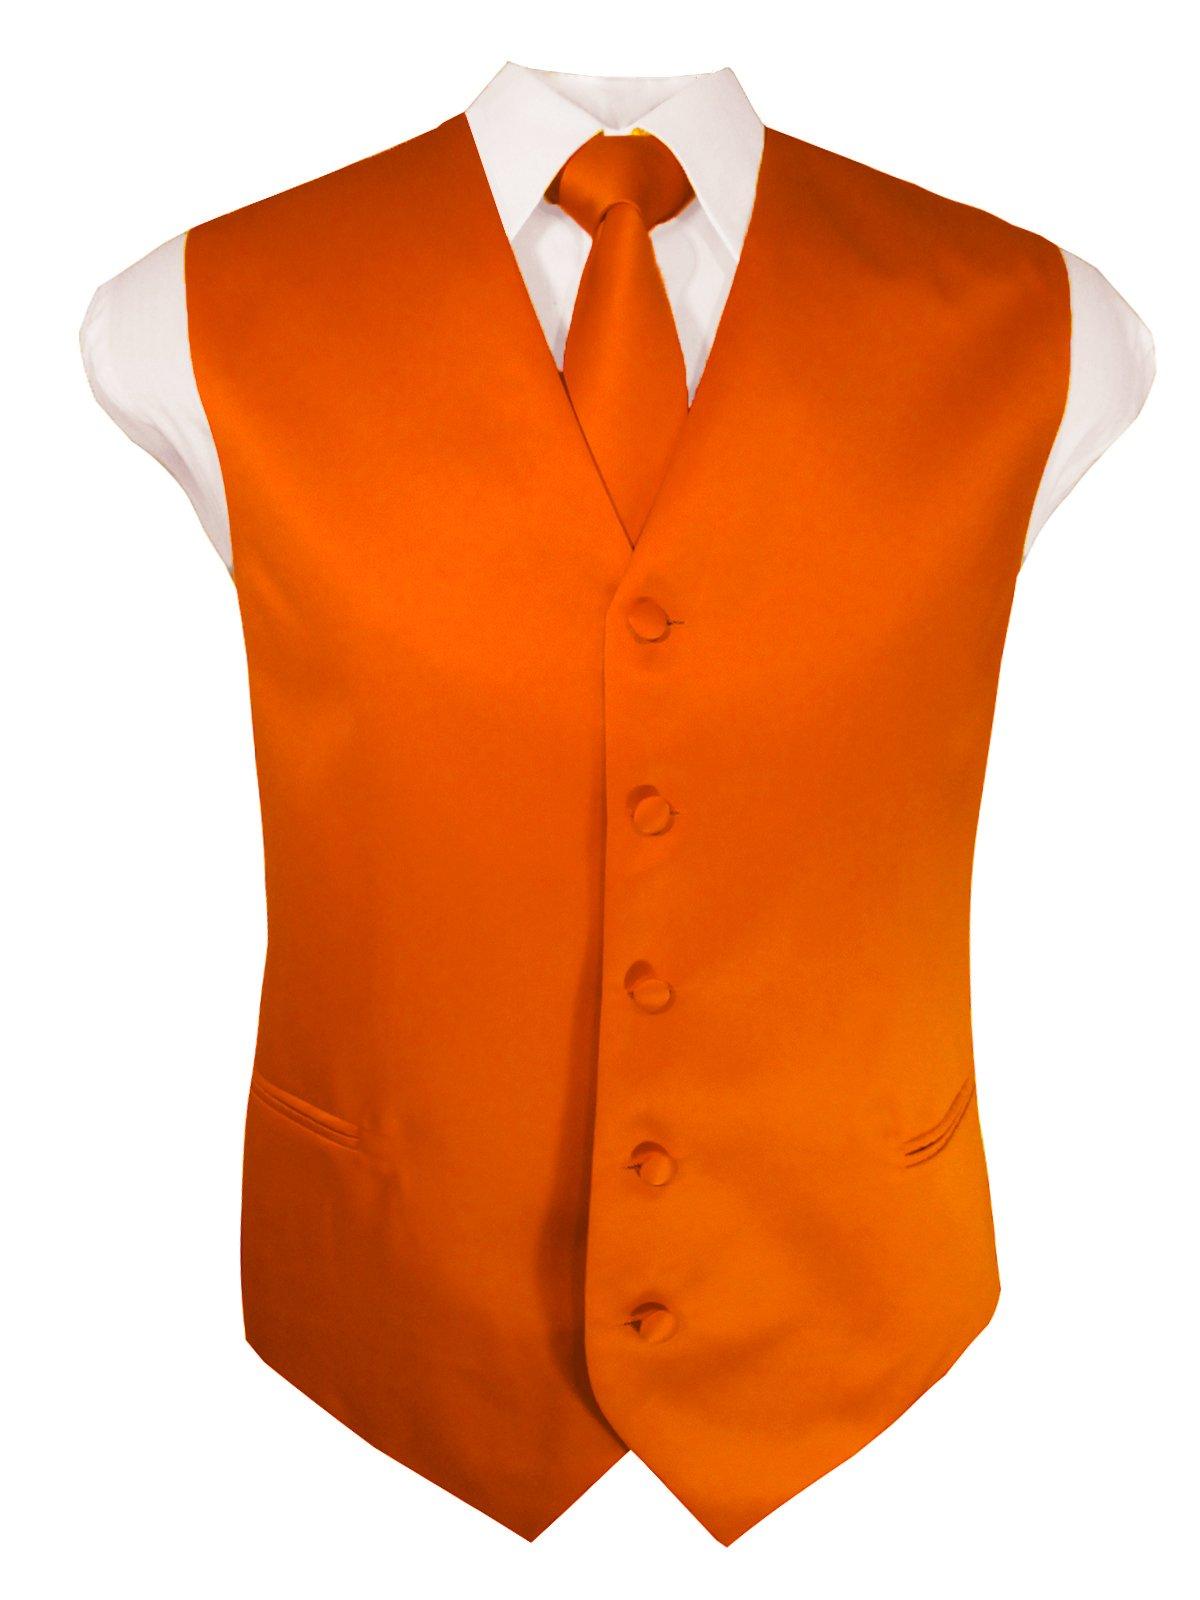 Guytalk Mens 3 Piece Tuxedo Vest for Formal Party, Wedding, Prom, Bartender XXXXL Orange